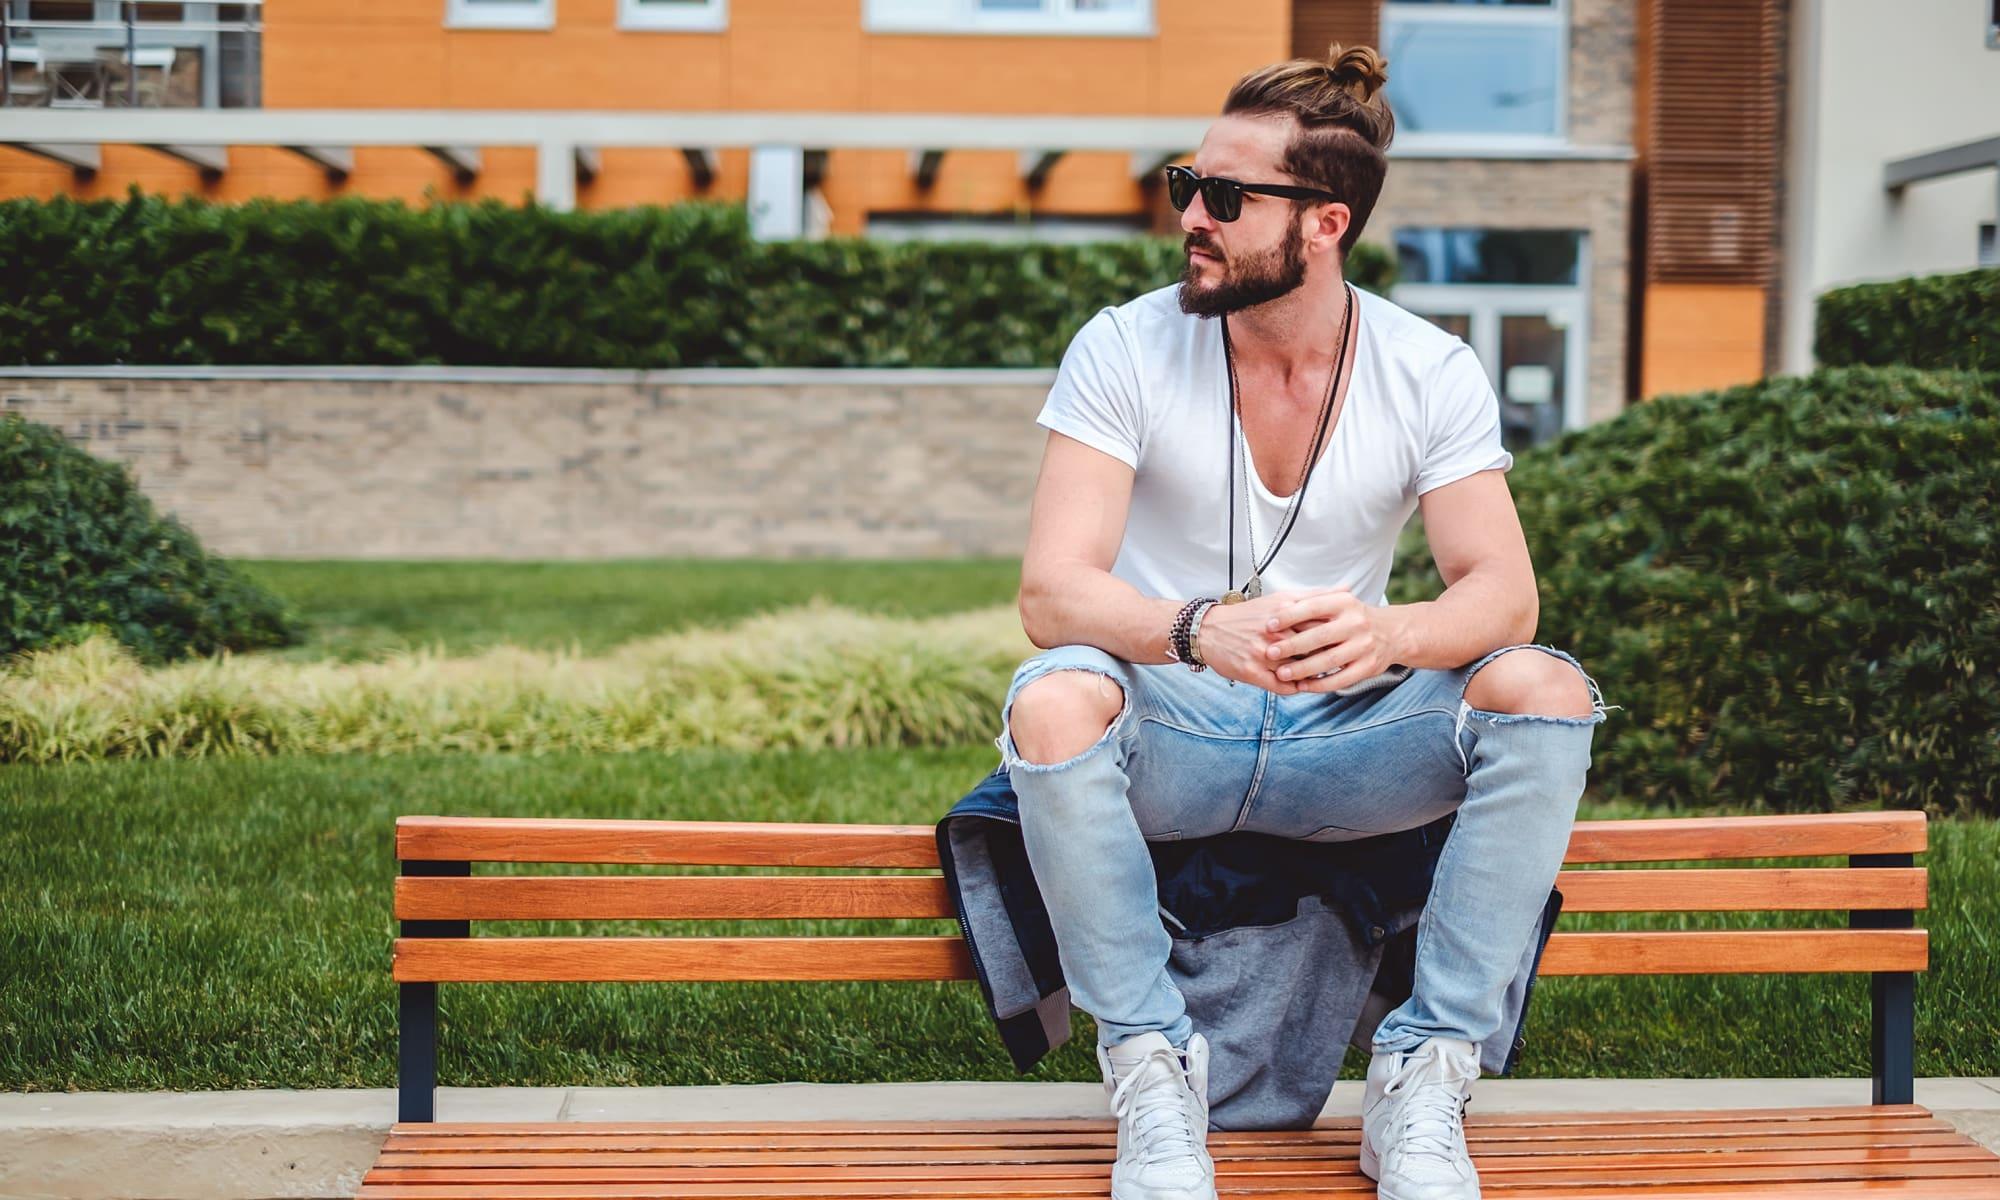 Man sitting on bench nearby Alta Citizen in Newport News